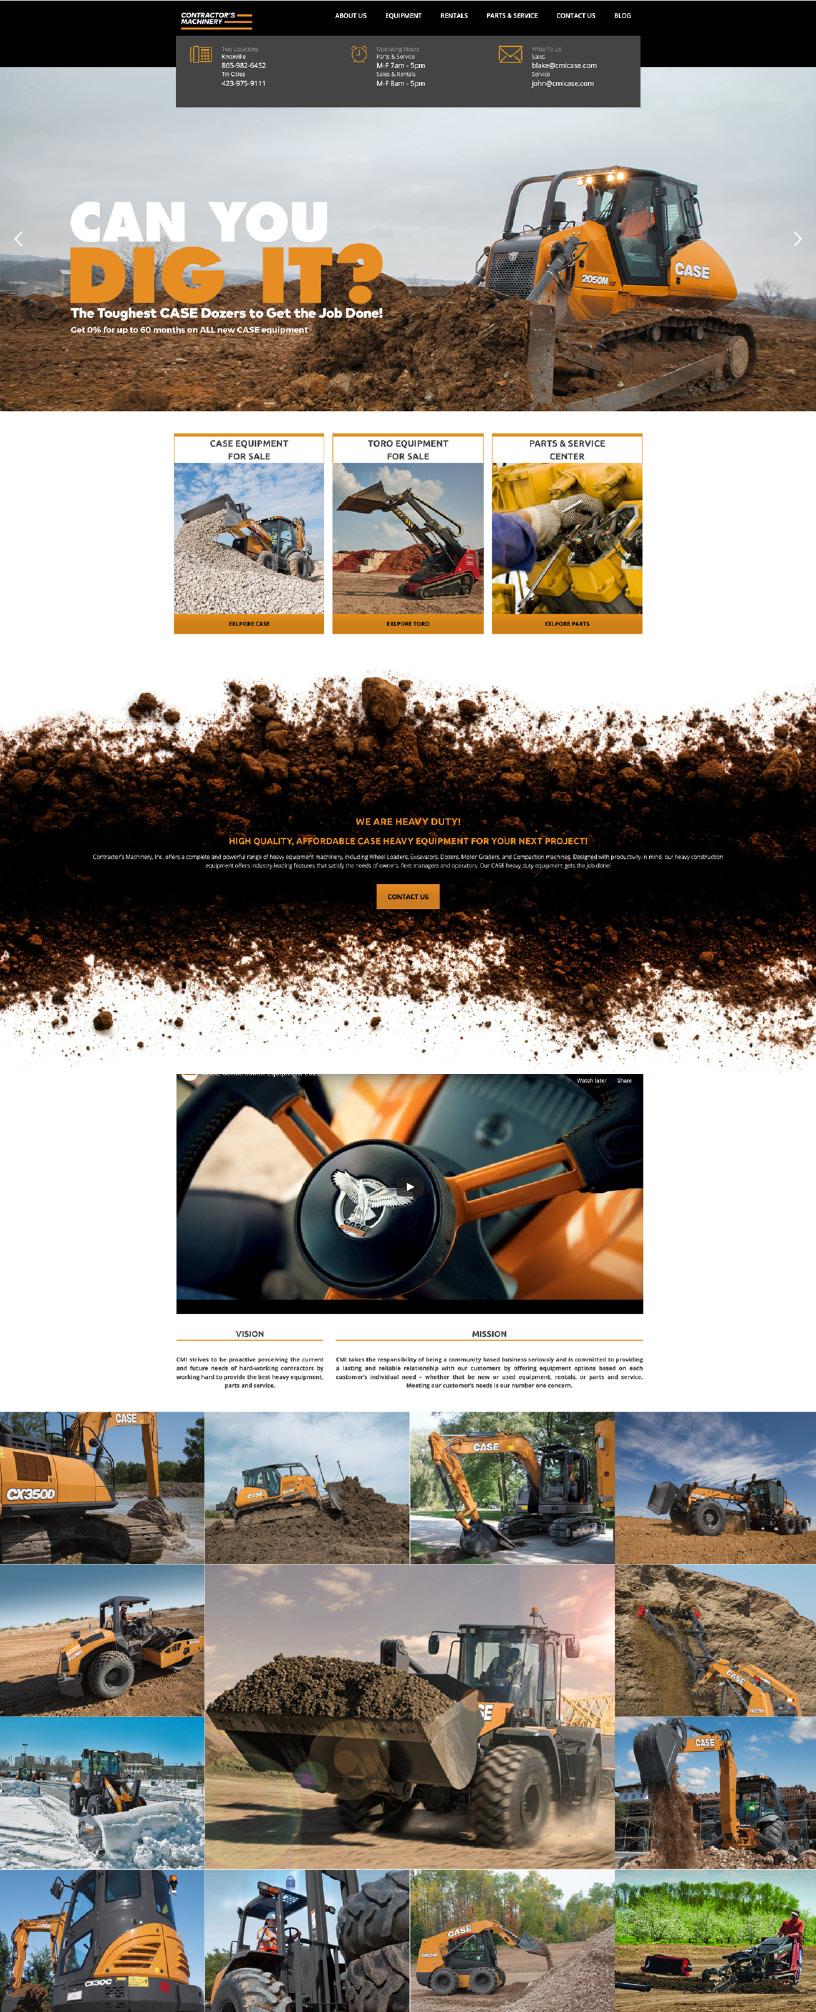 Contractor's Machinery, Inc. website redesign